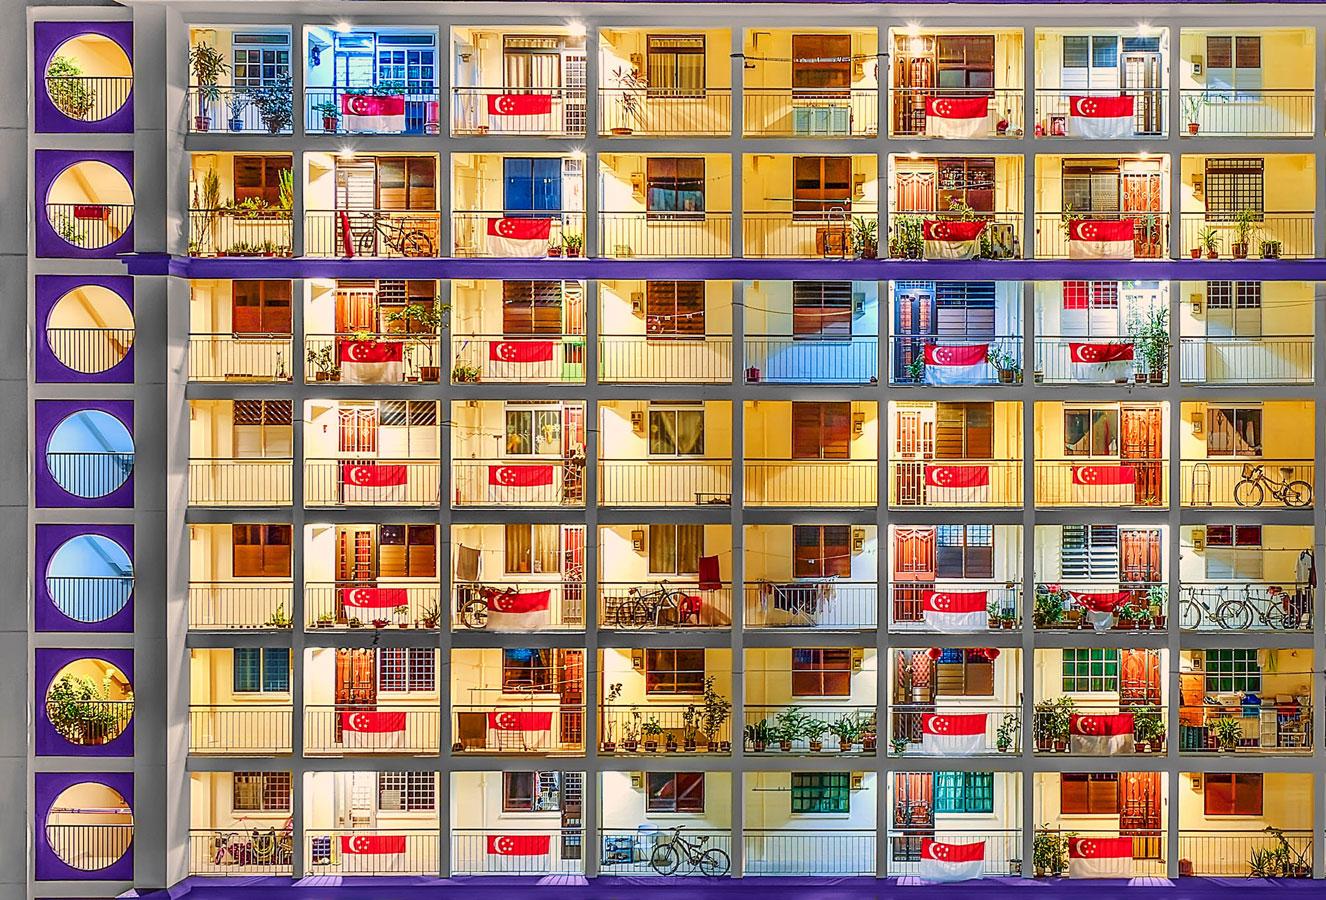 Лестер Ко Мэн Хуа, Сингапур / Lester Koh Meng Hua, Singapore, Национальная премия, Фотоконкурс Sony World Photography Awards 2017